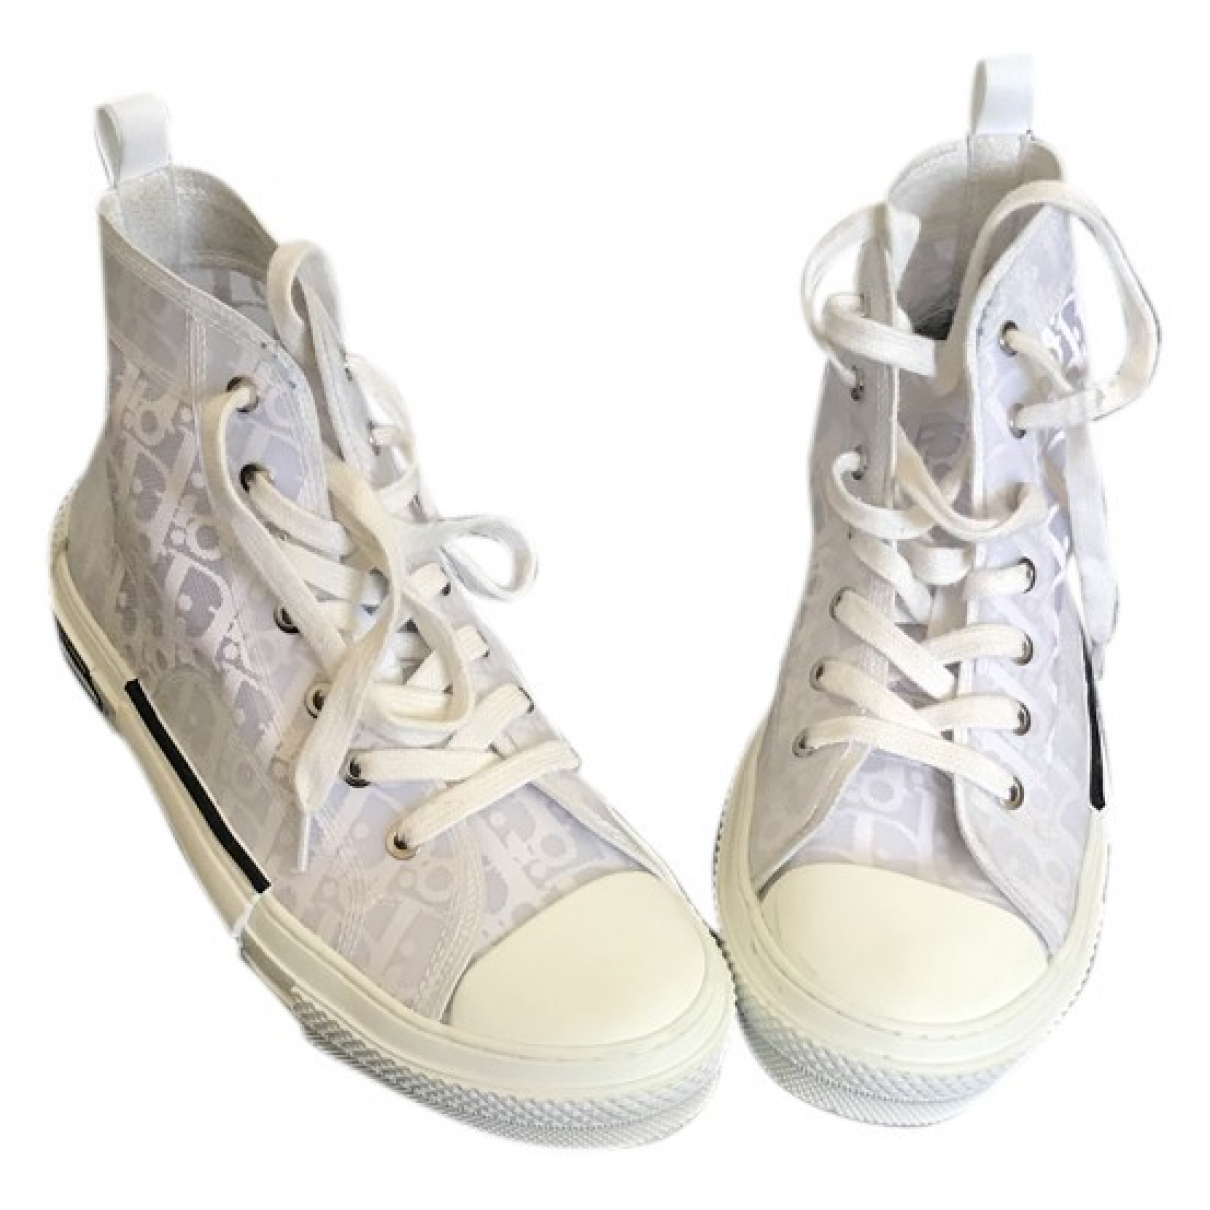 Dior B23 White Cloth Trainers for Women 41 EU